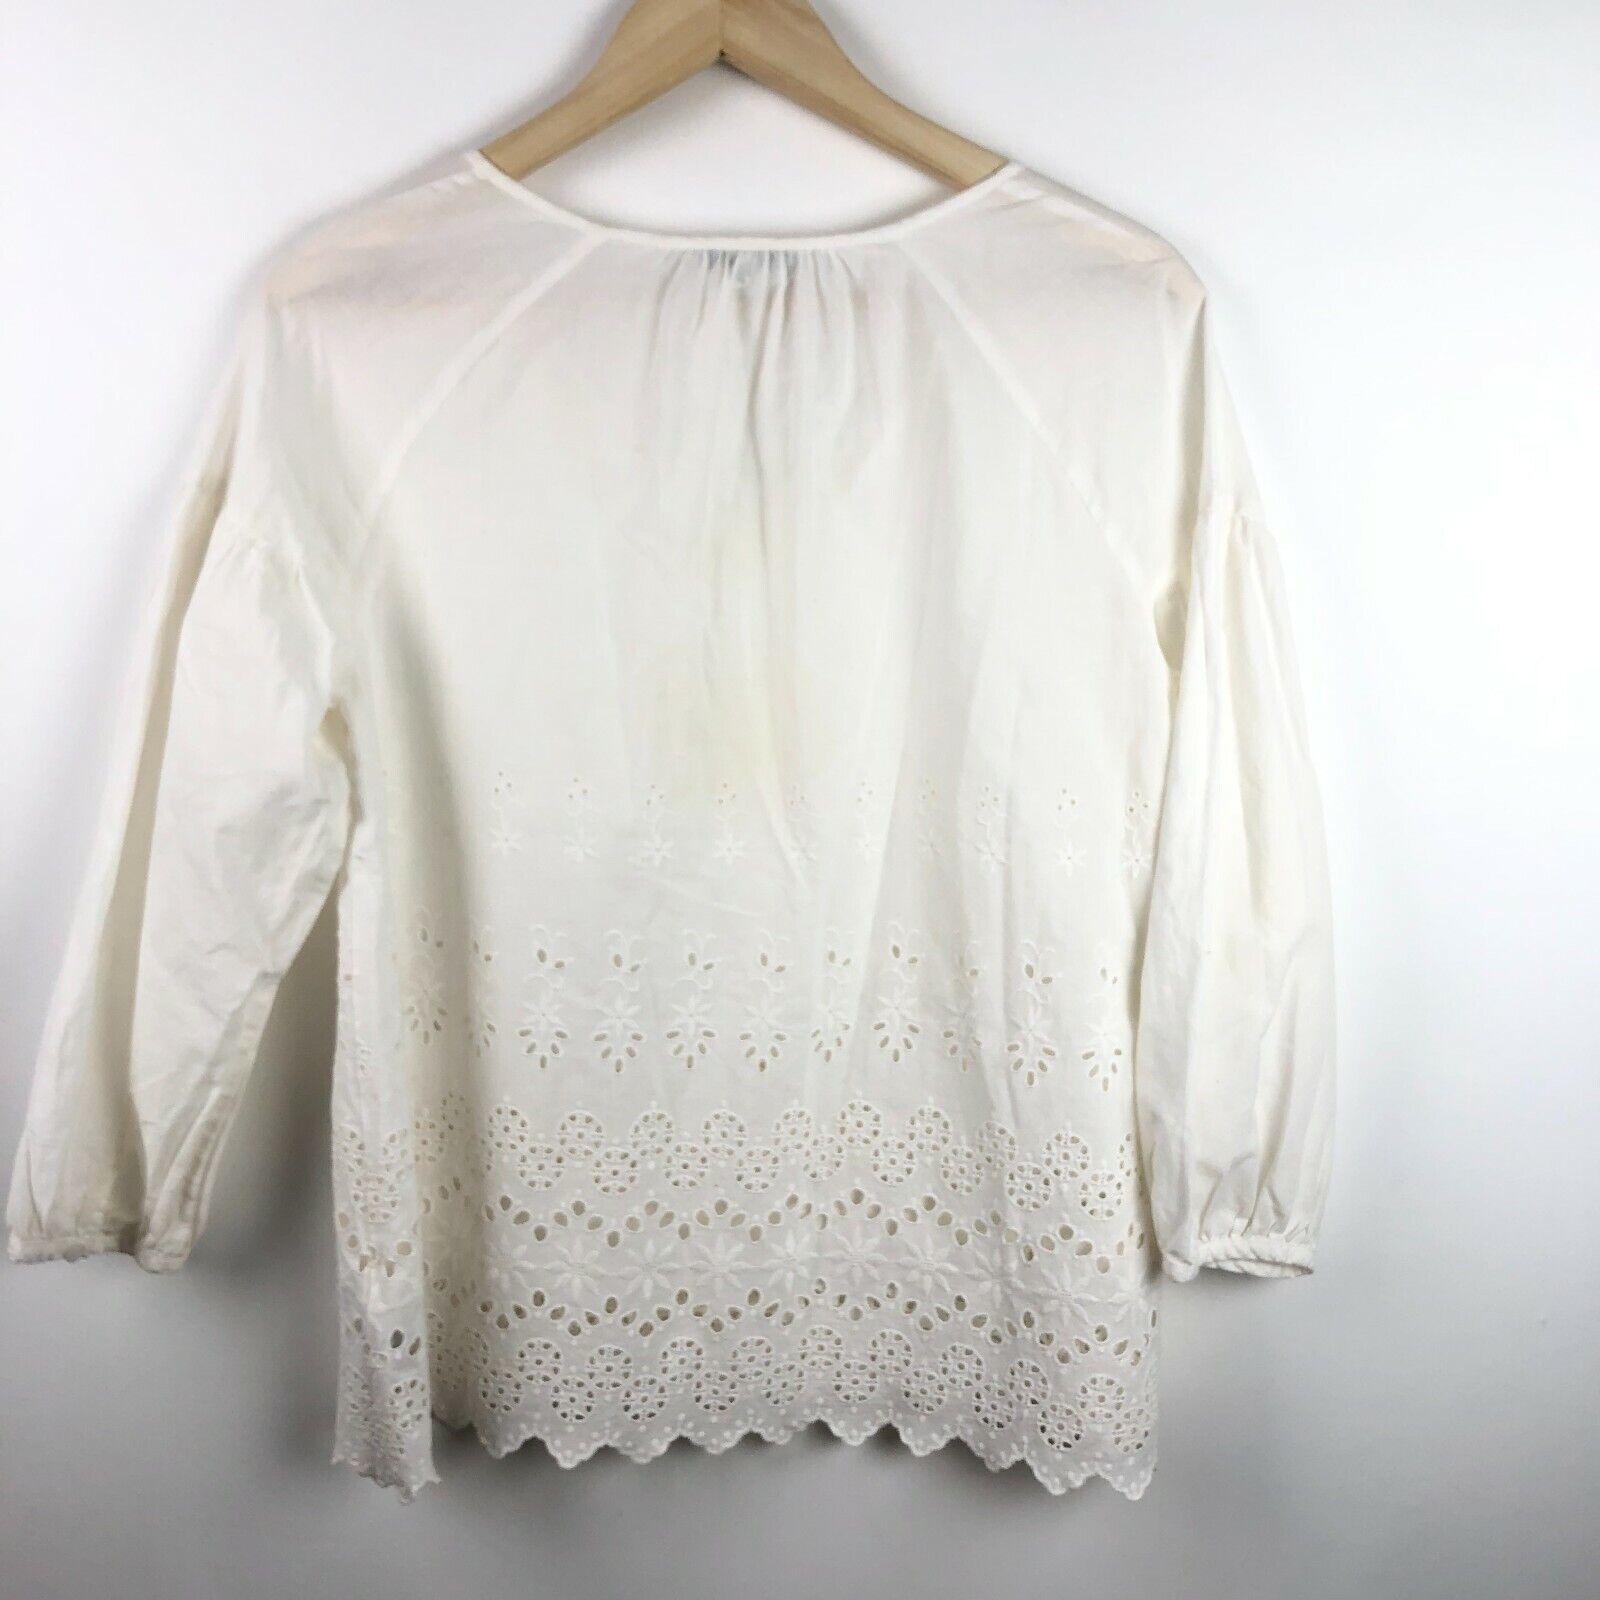 Madewell Eyelet Lattice Top XS Crisp White Cotton… - image 6